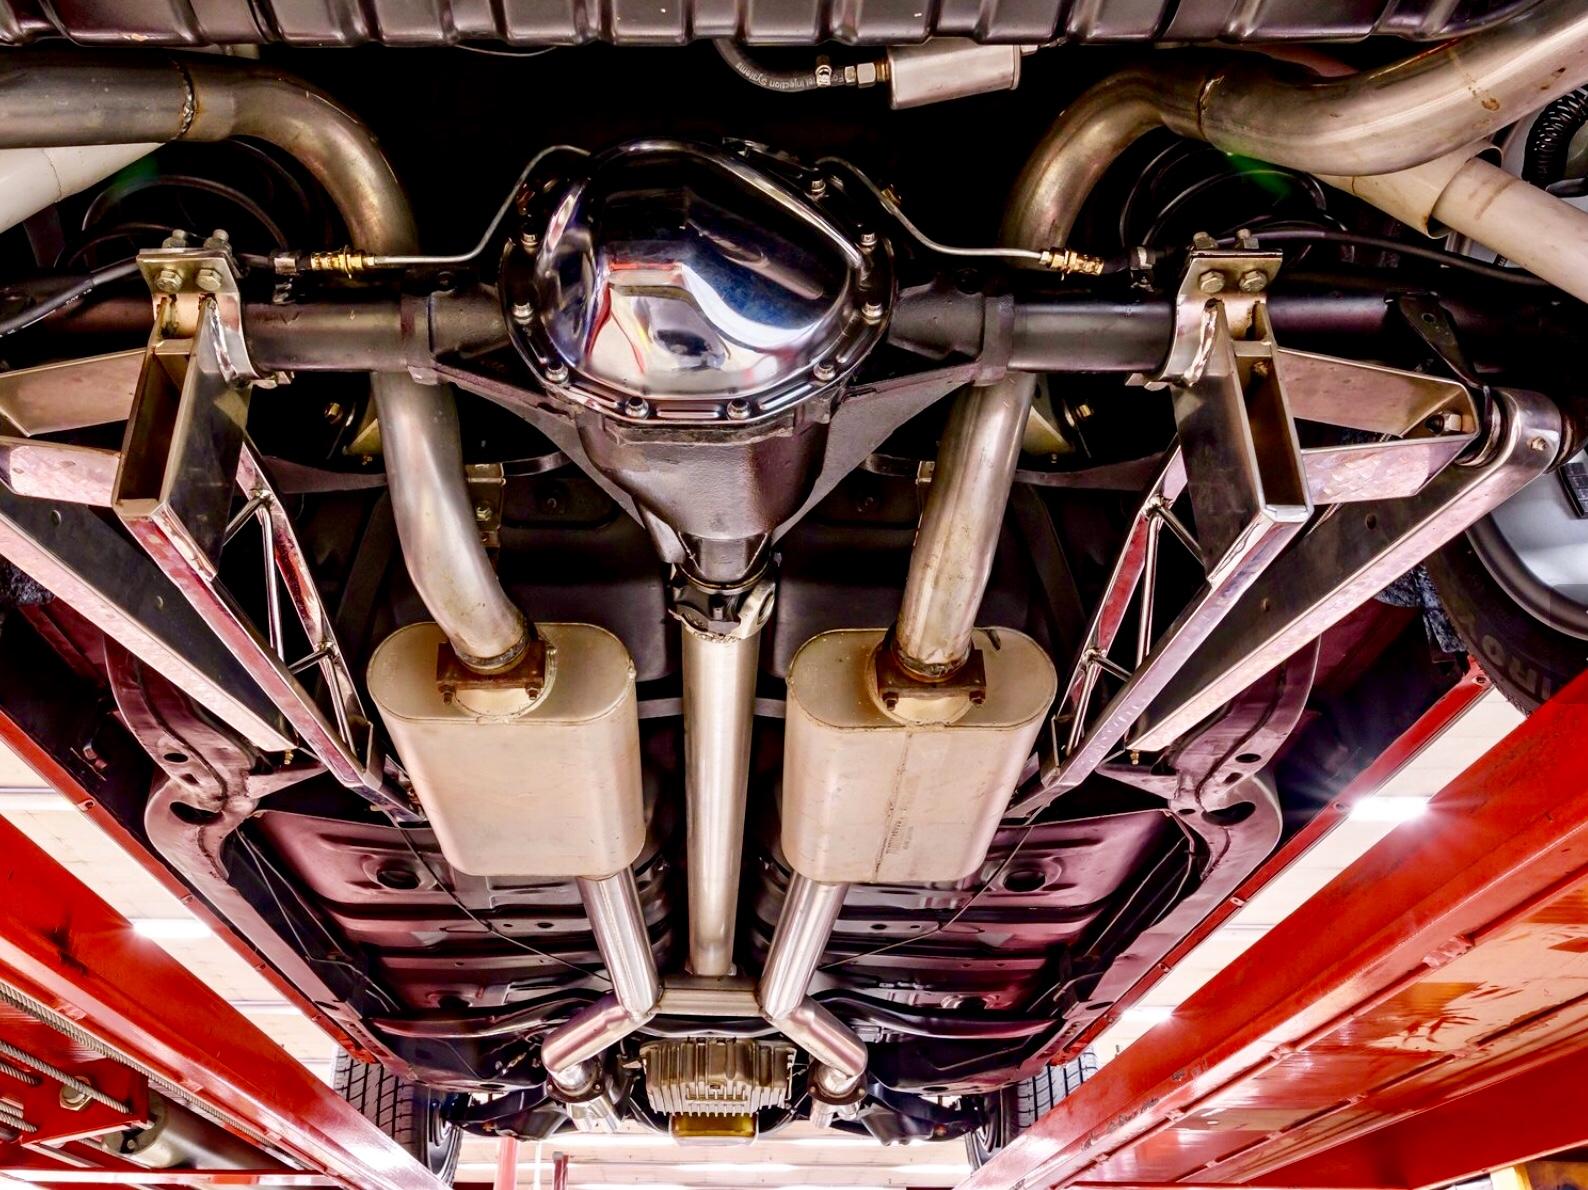 1967 Chevelle SuperSport